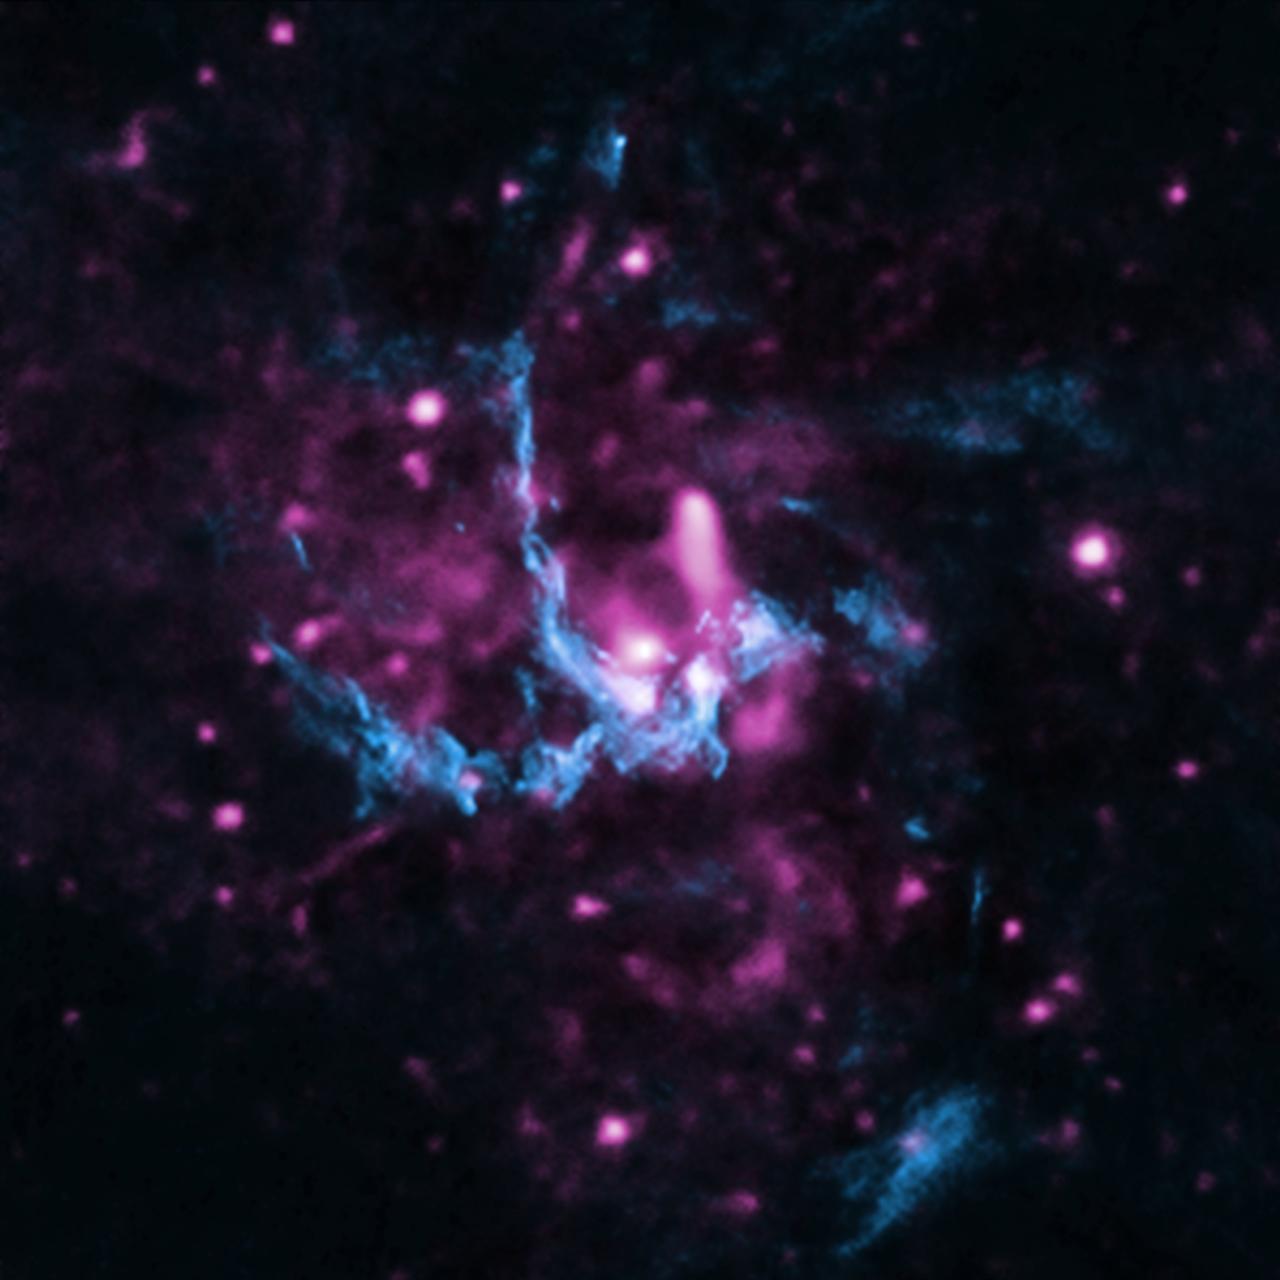 Supermassive black holes 10